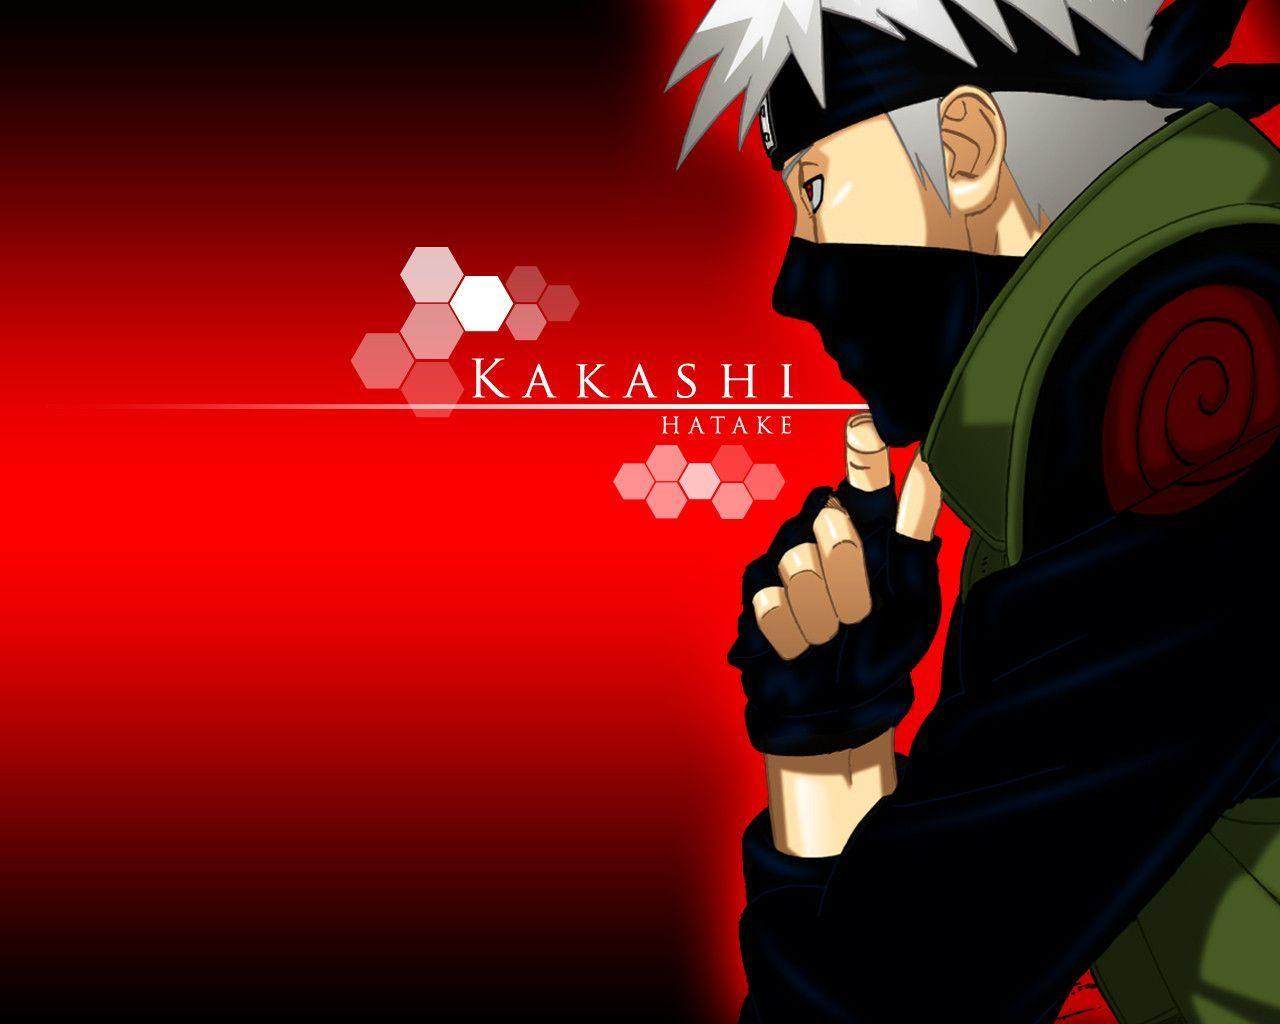 Kakashi Hatake Wallpapers 1280x1024